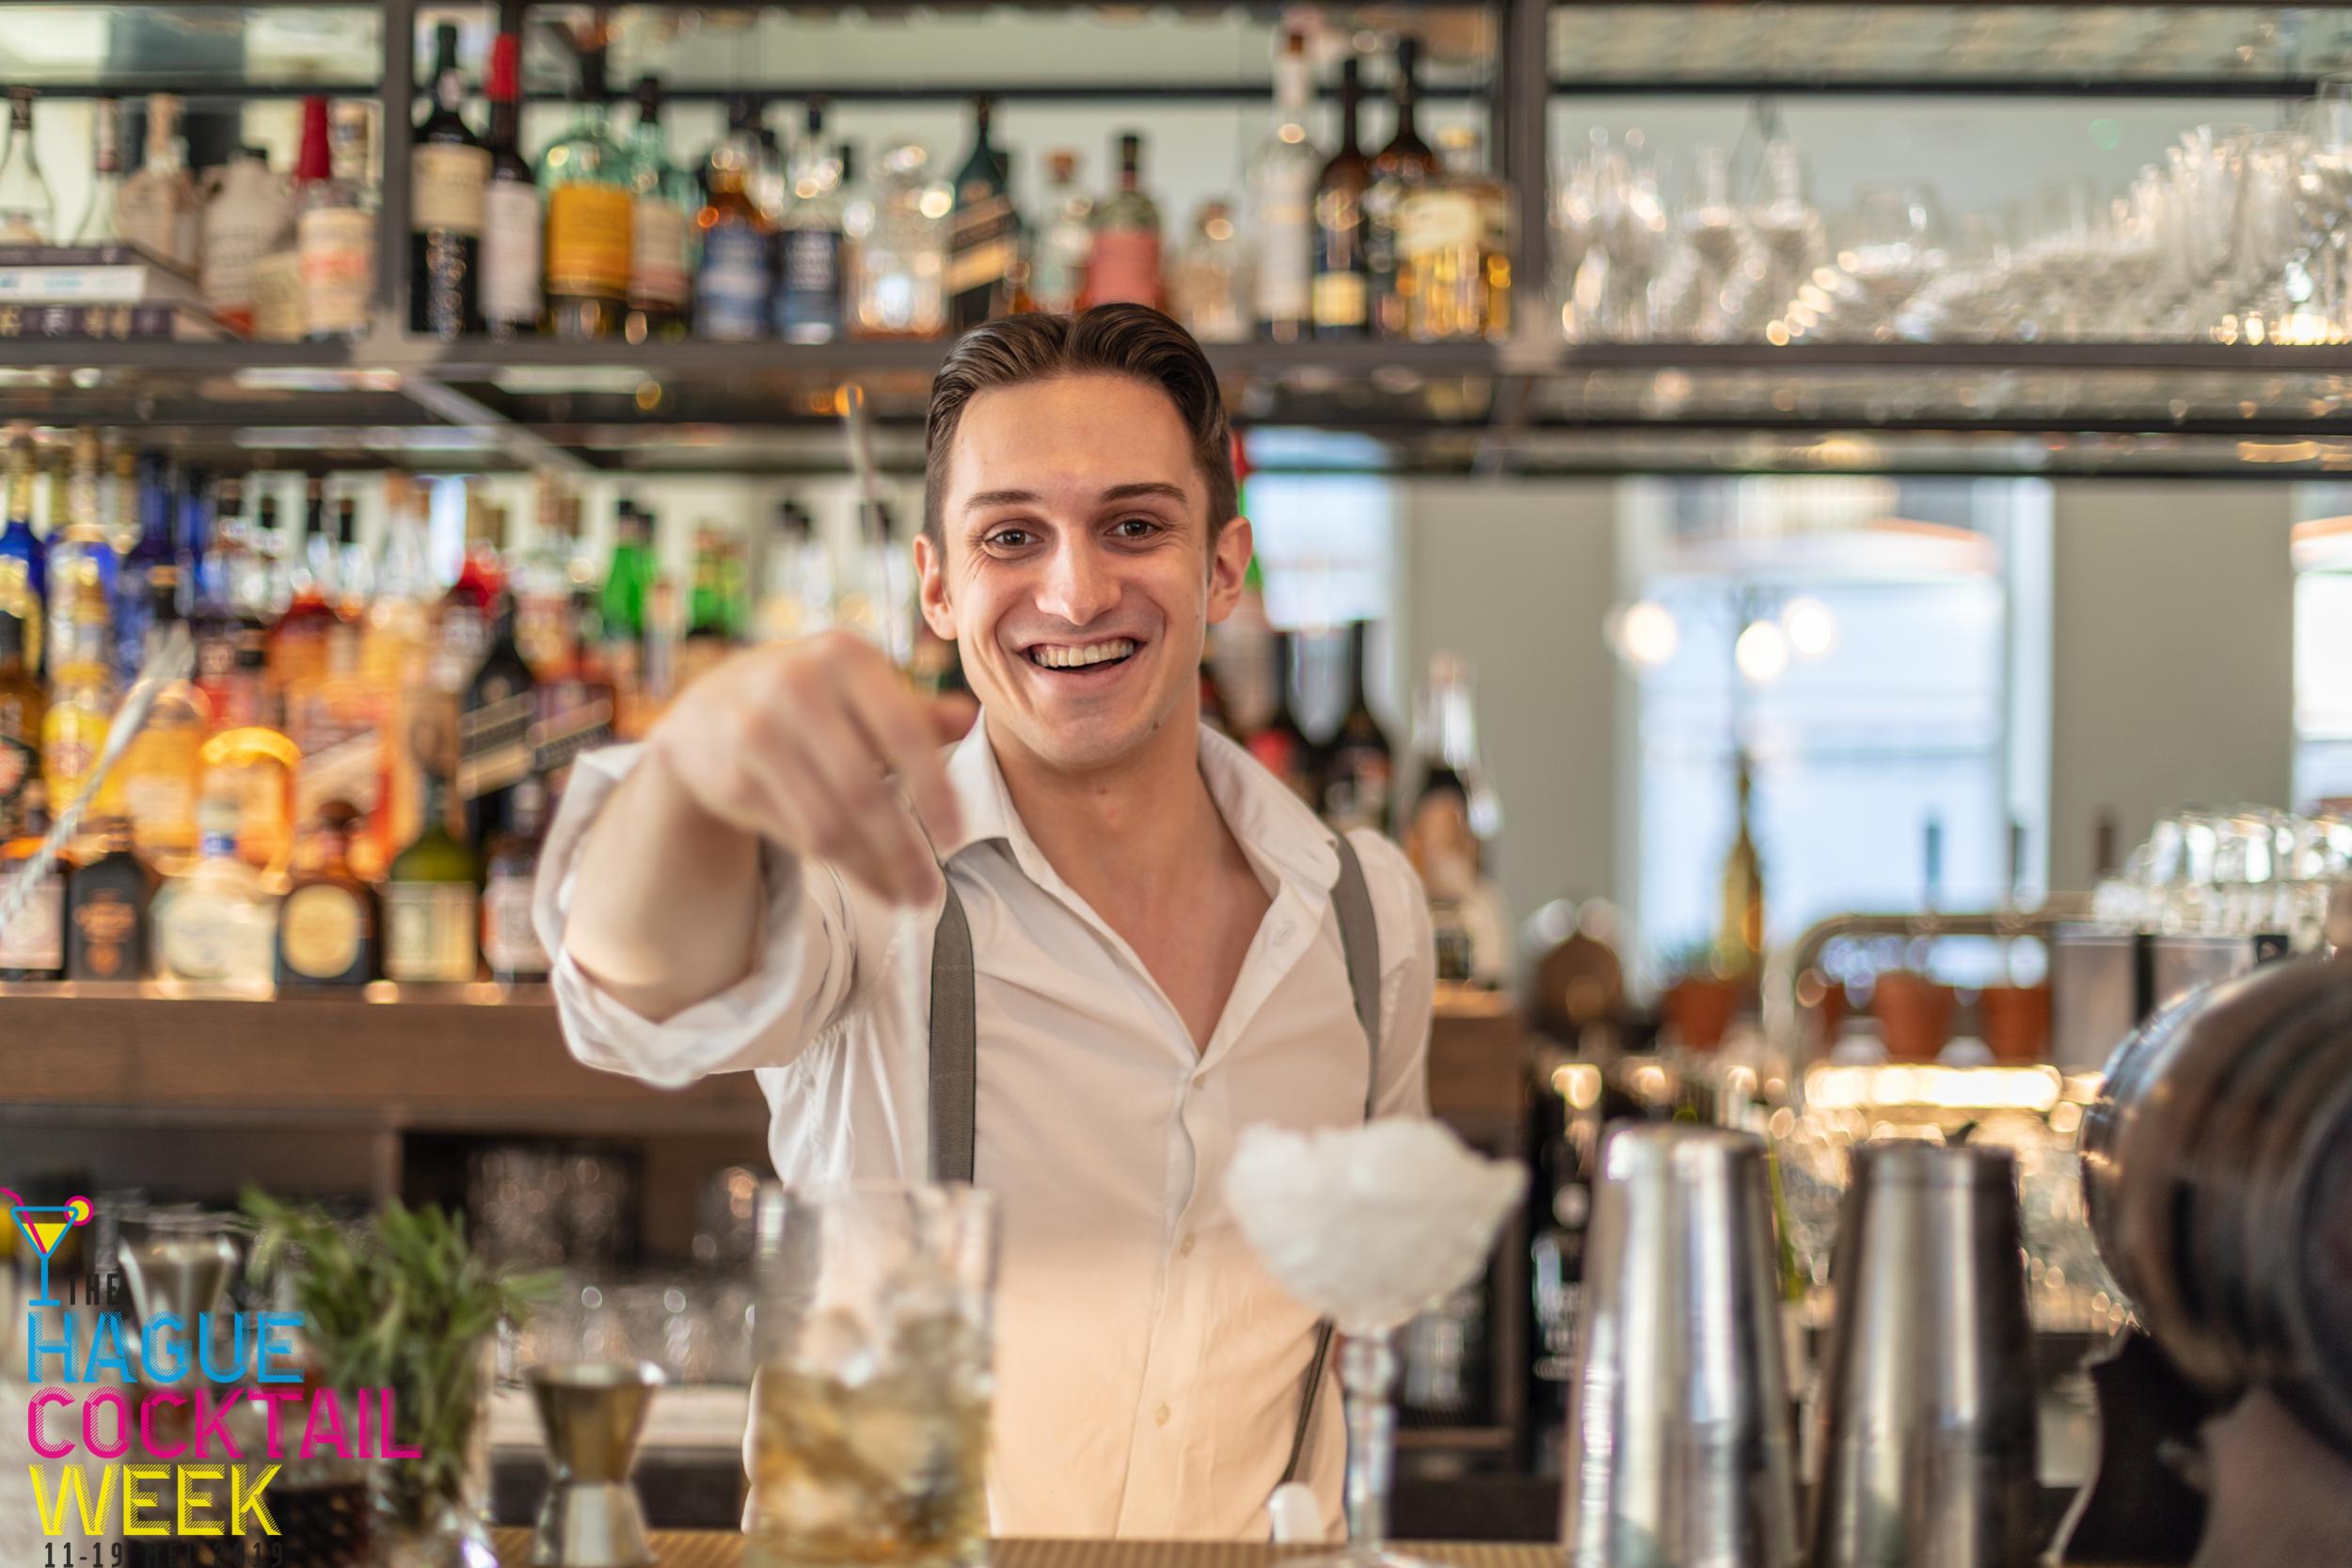 Tapisco | The Hague Cocktailweek-1.jpg